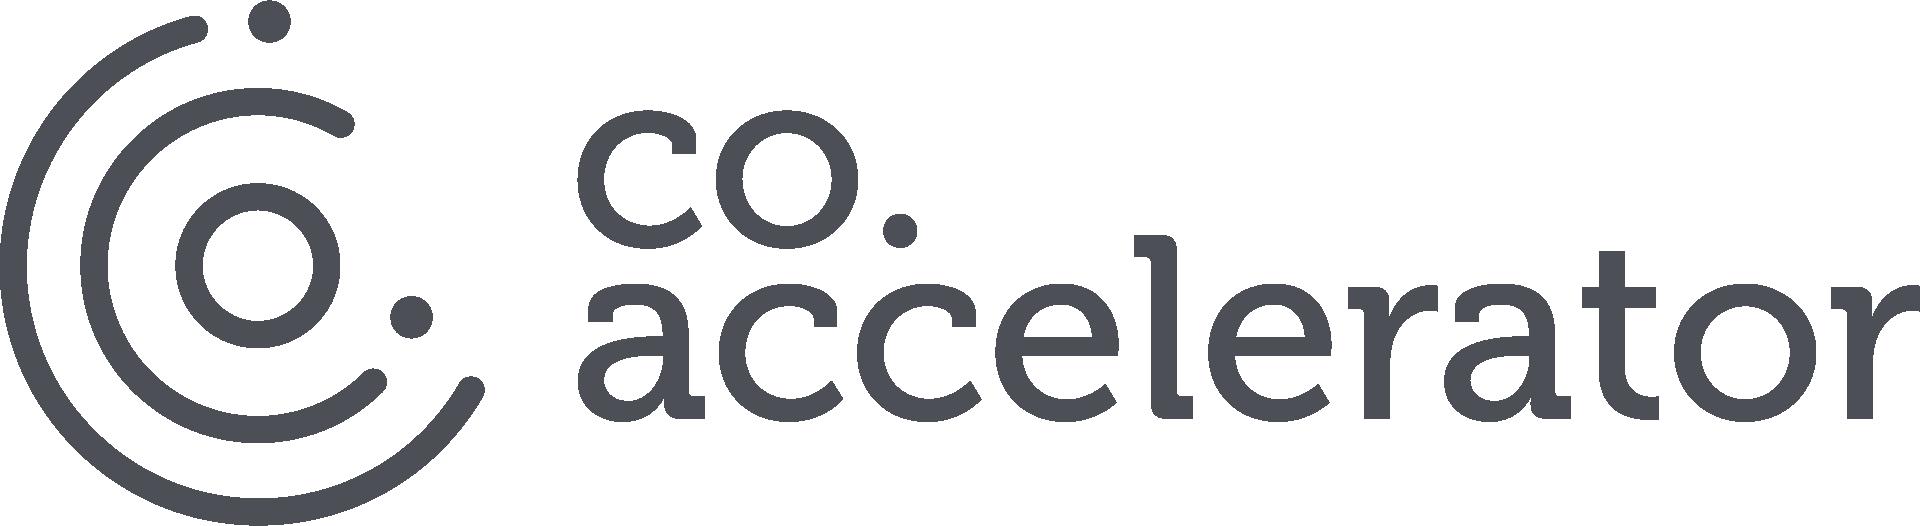 full-logo-fixed-mono.png